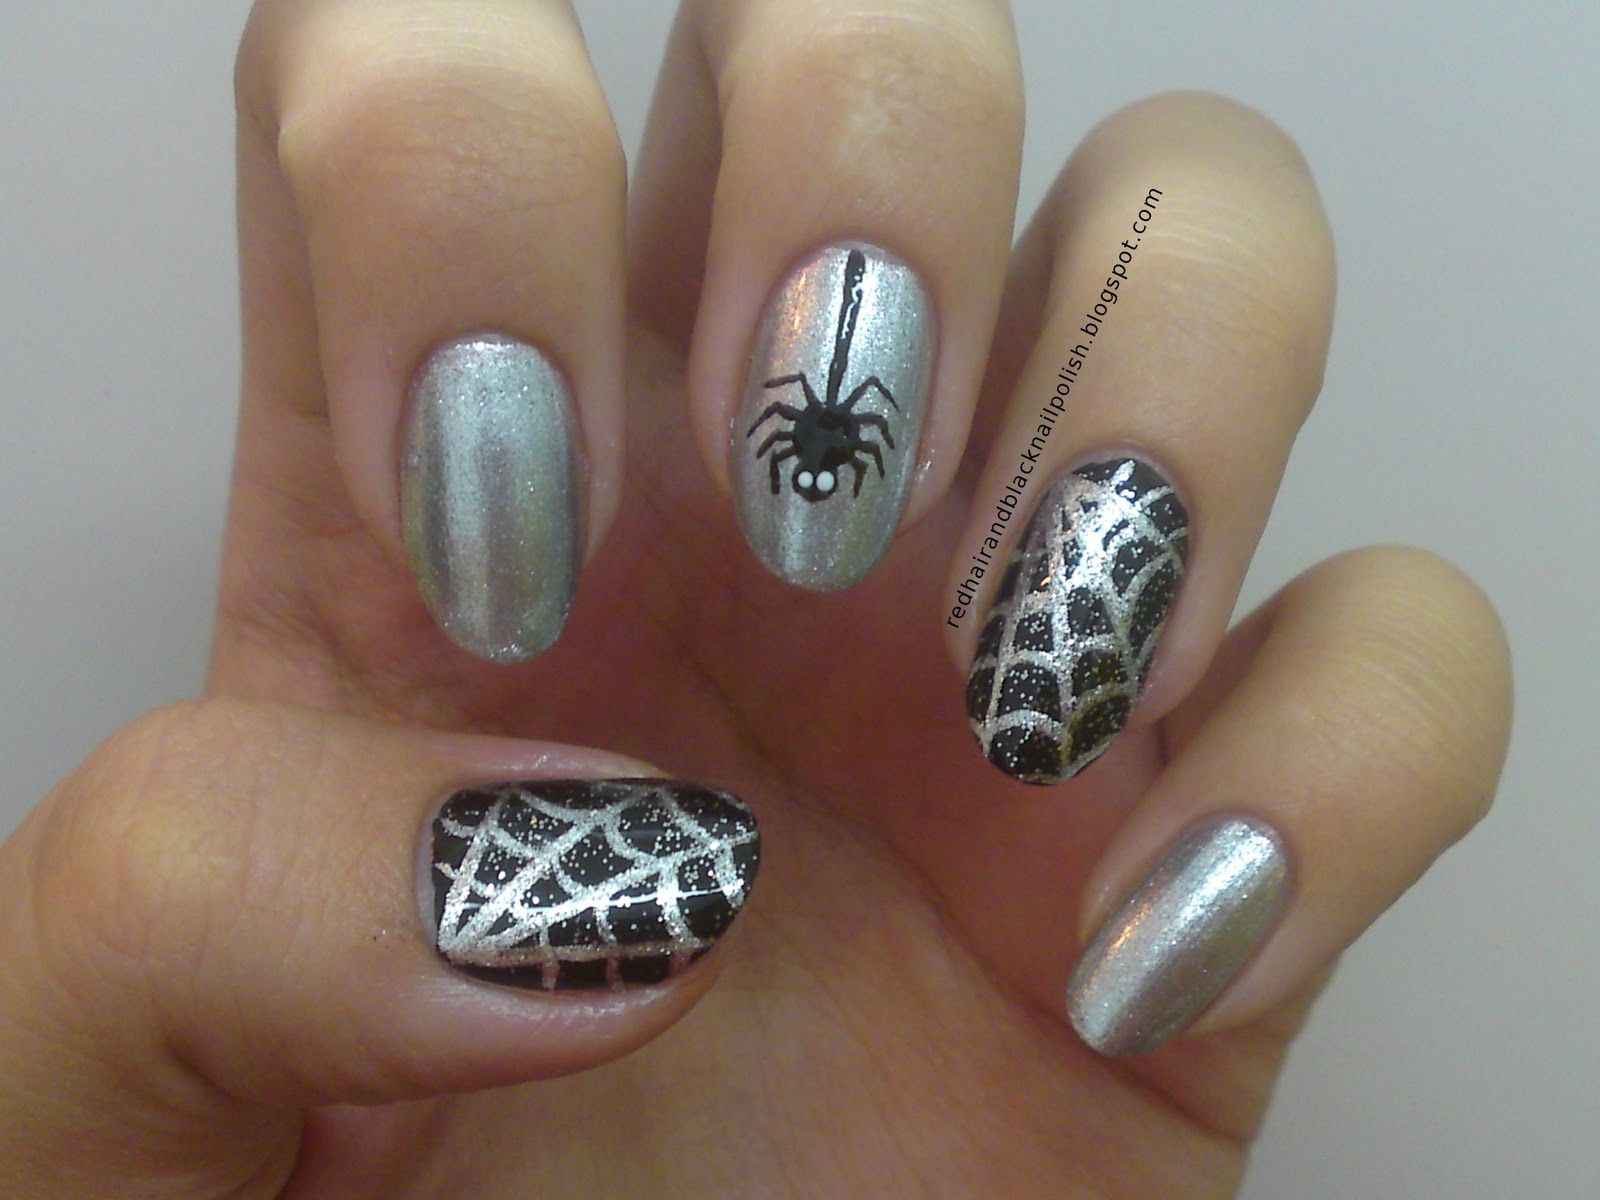 Spiderweb silver and black nails